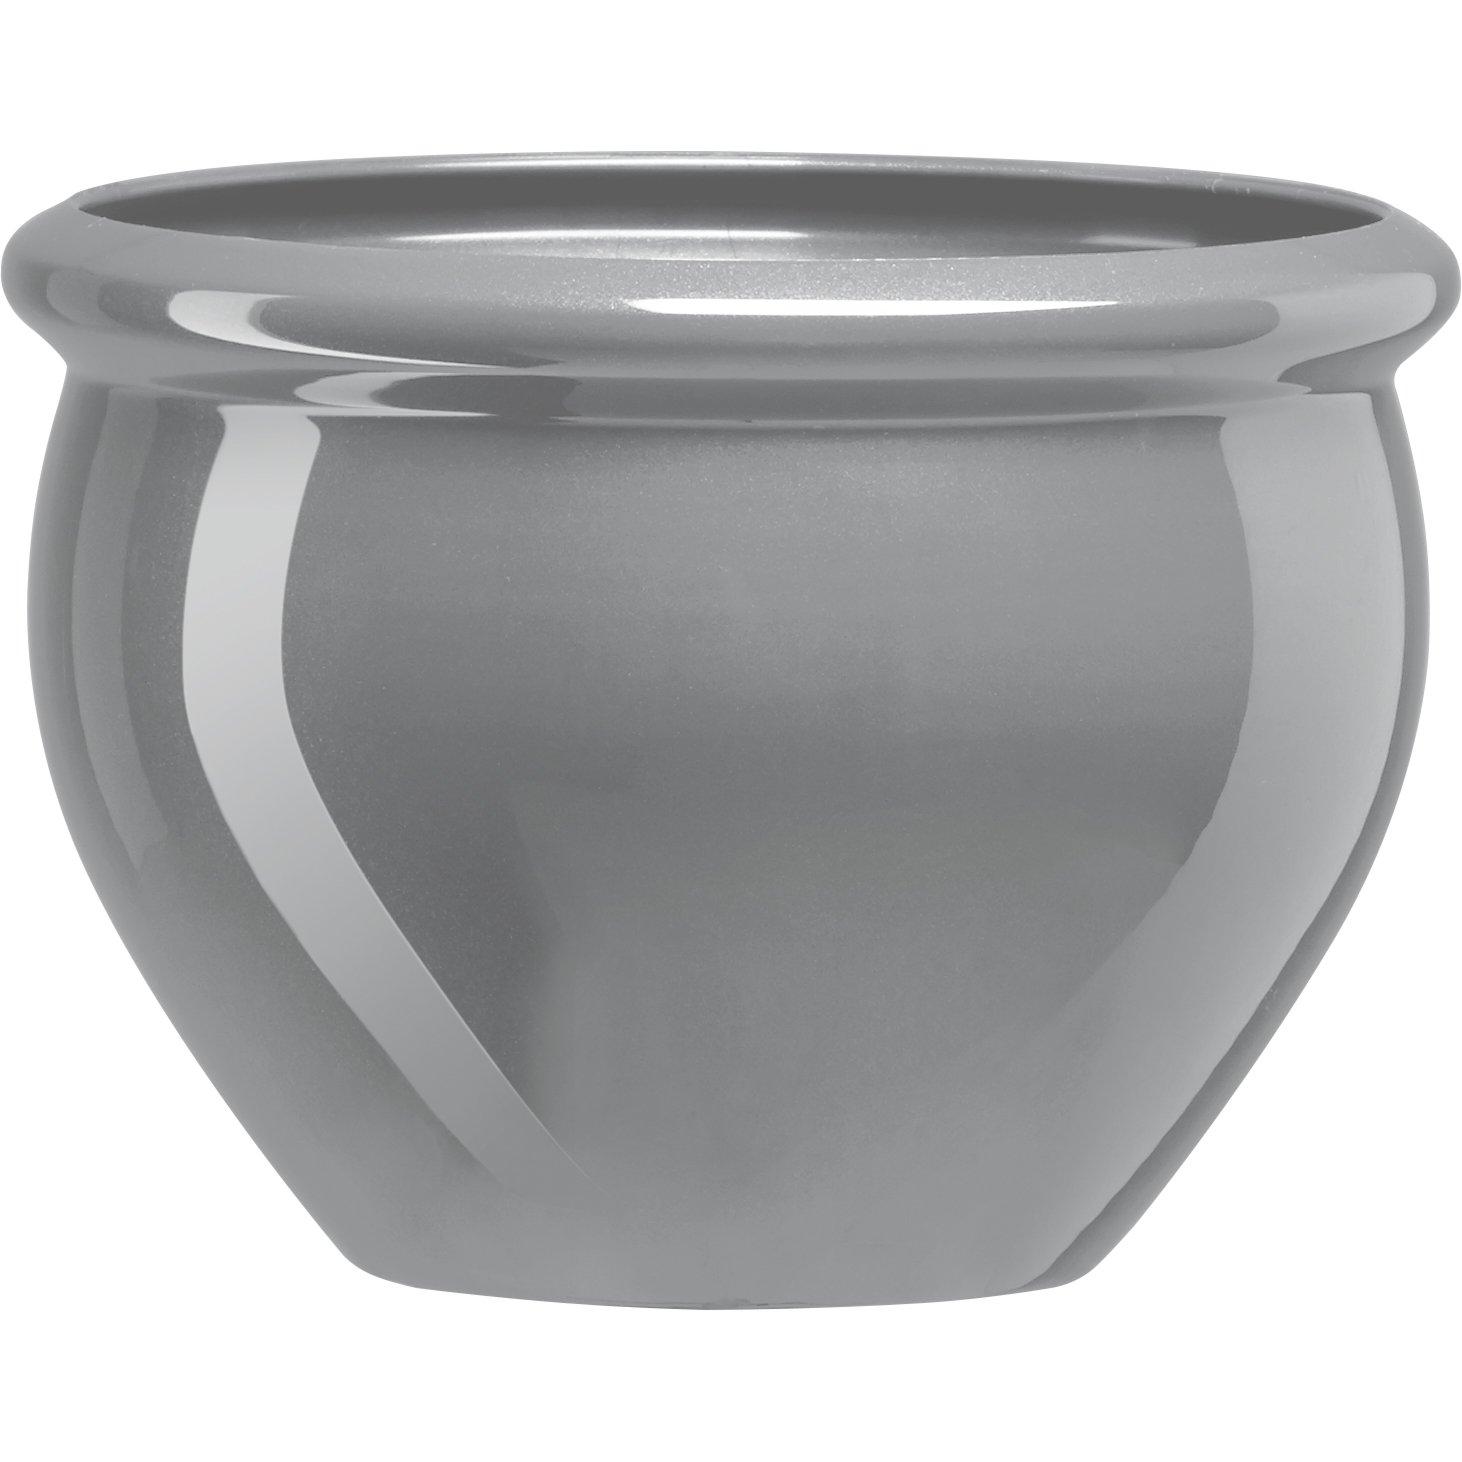 Emsa 501869 SIENA NOBILE round planter, ø 26 x 19 cm, anthracite Emsa (FO)